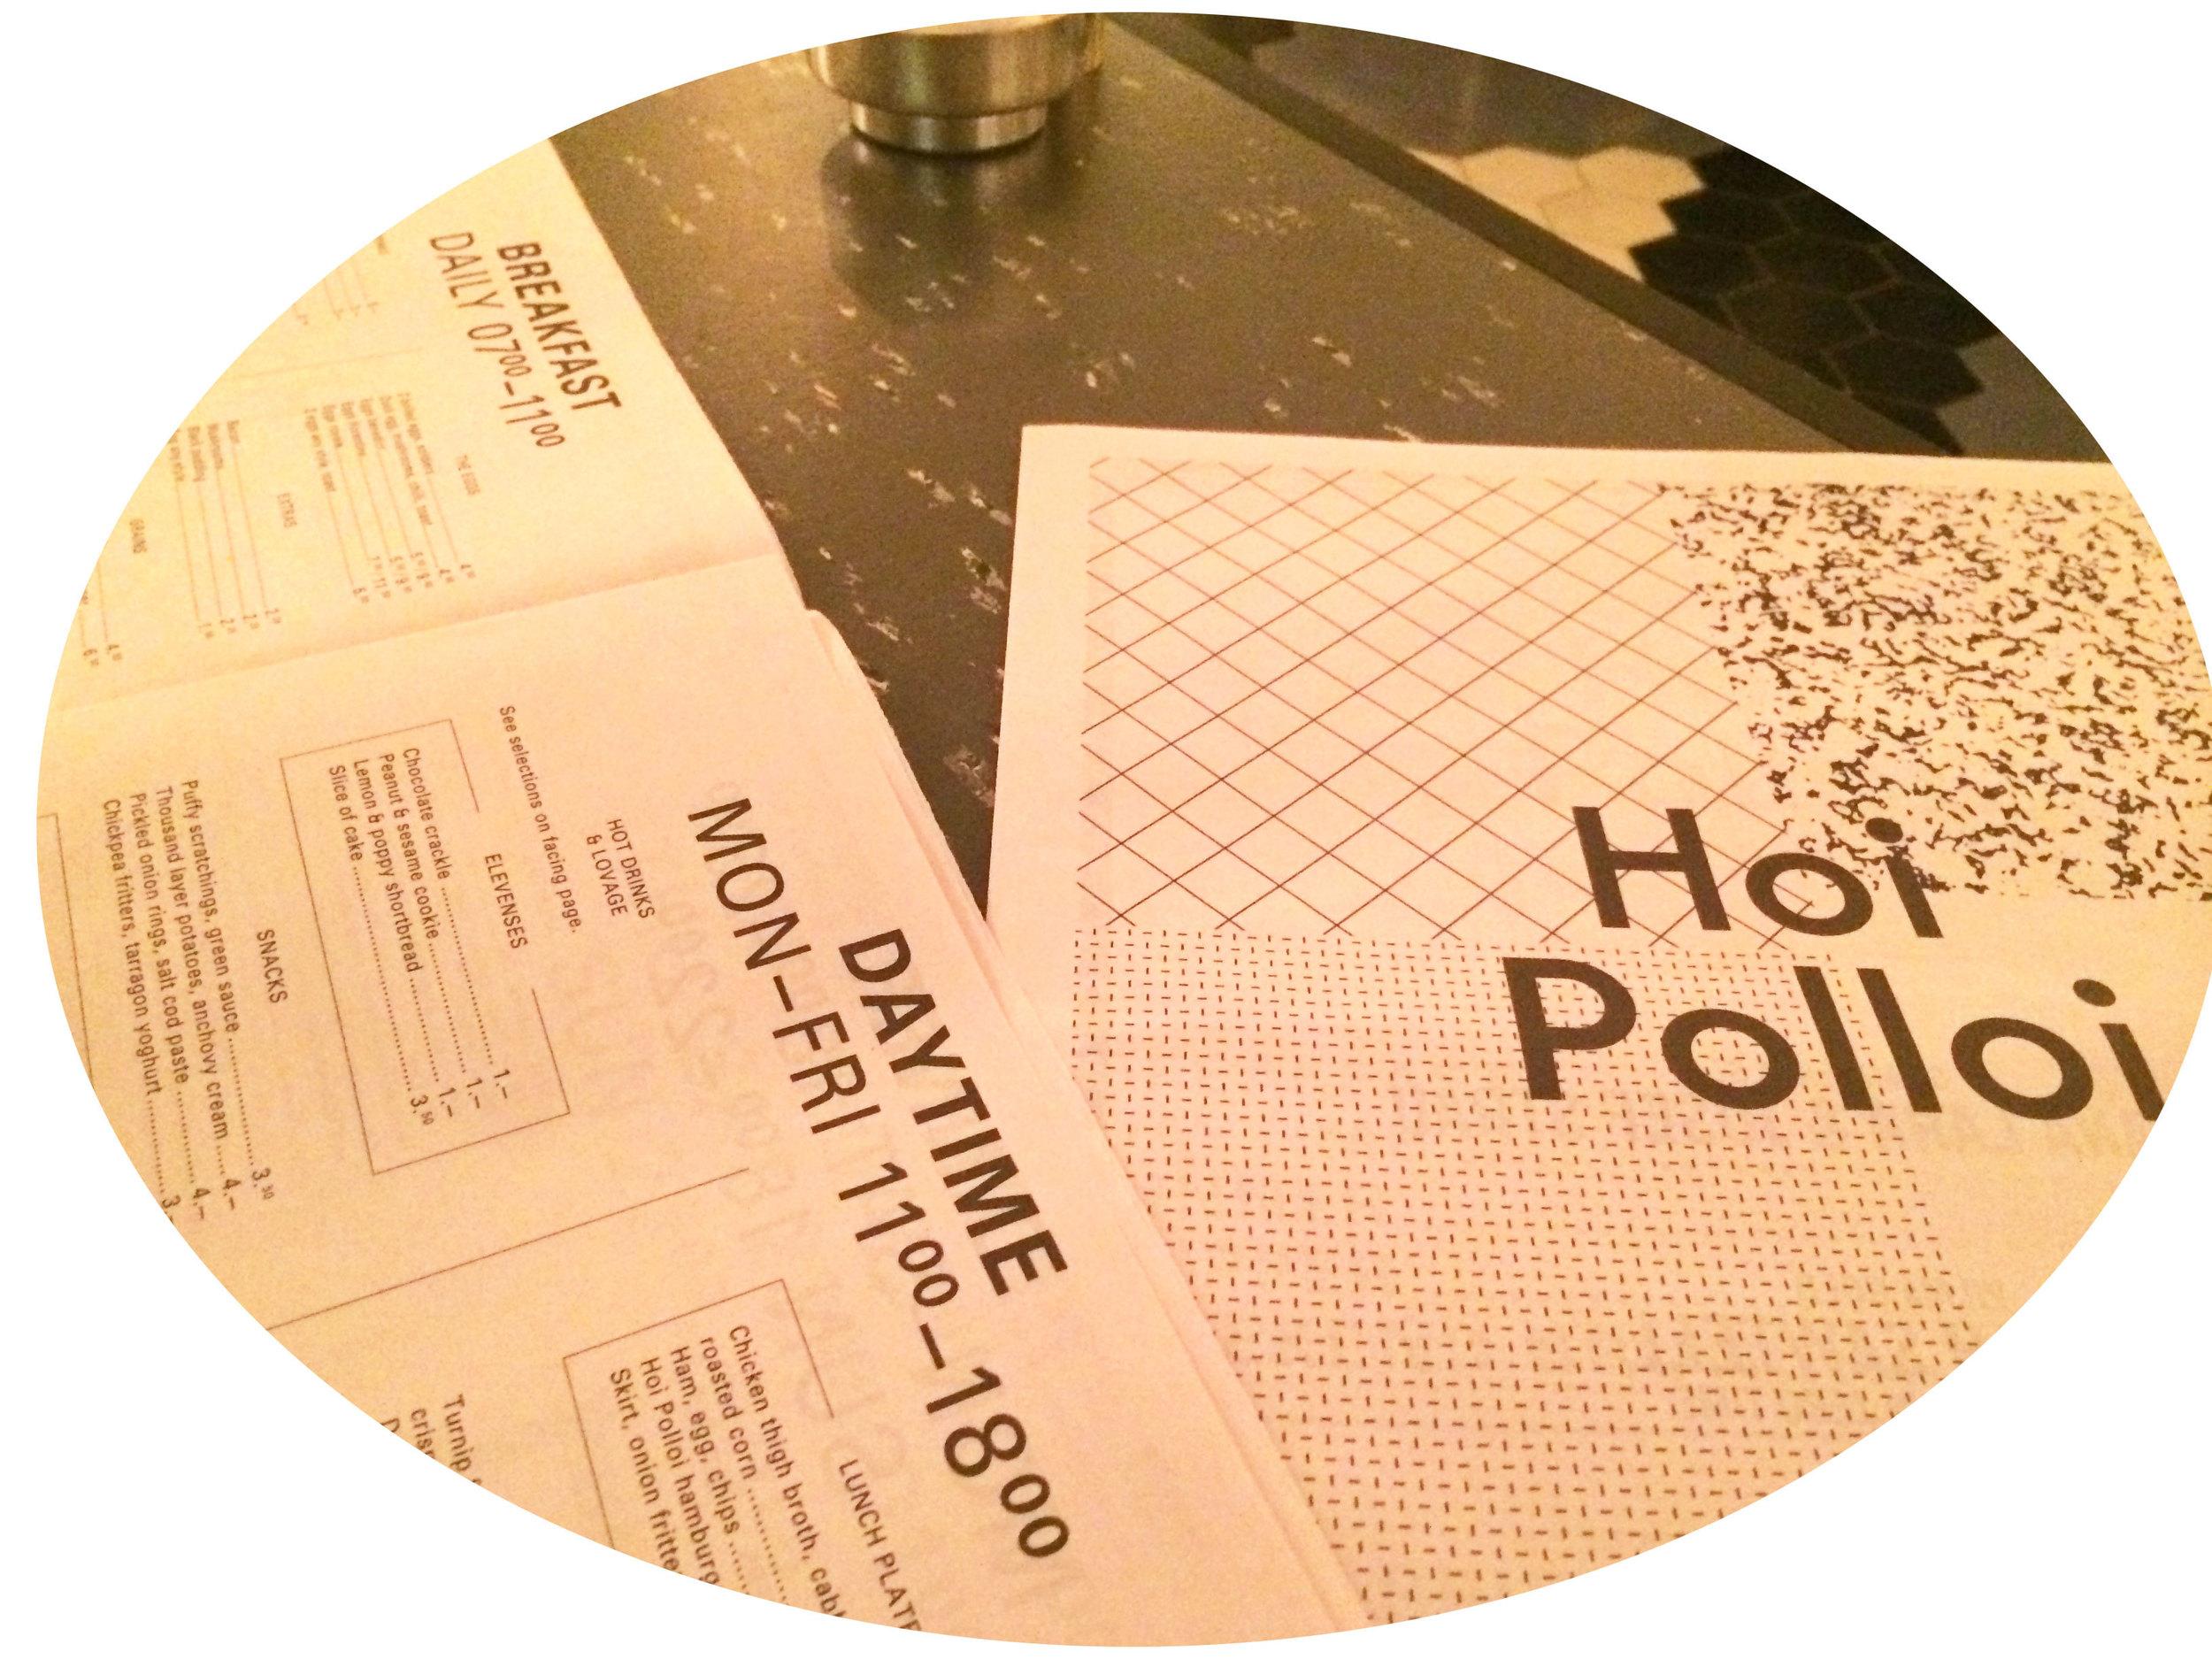 Hoi Polloi, Ace Hotel London -- Second Floor Flat